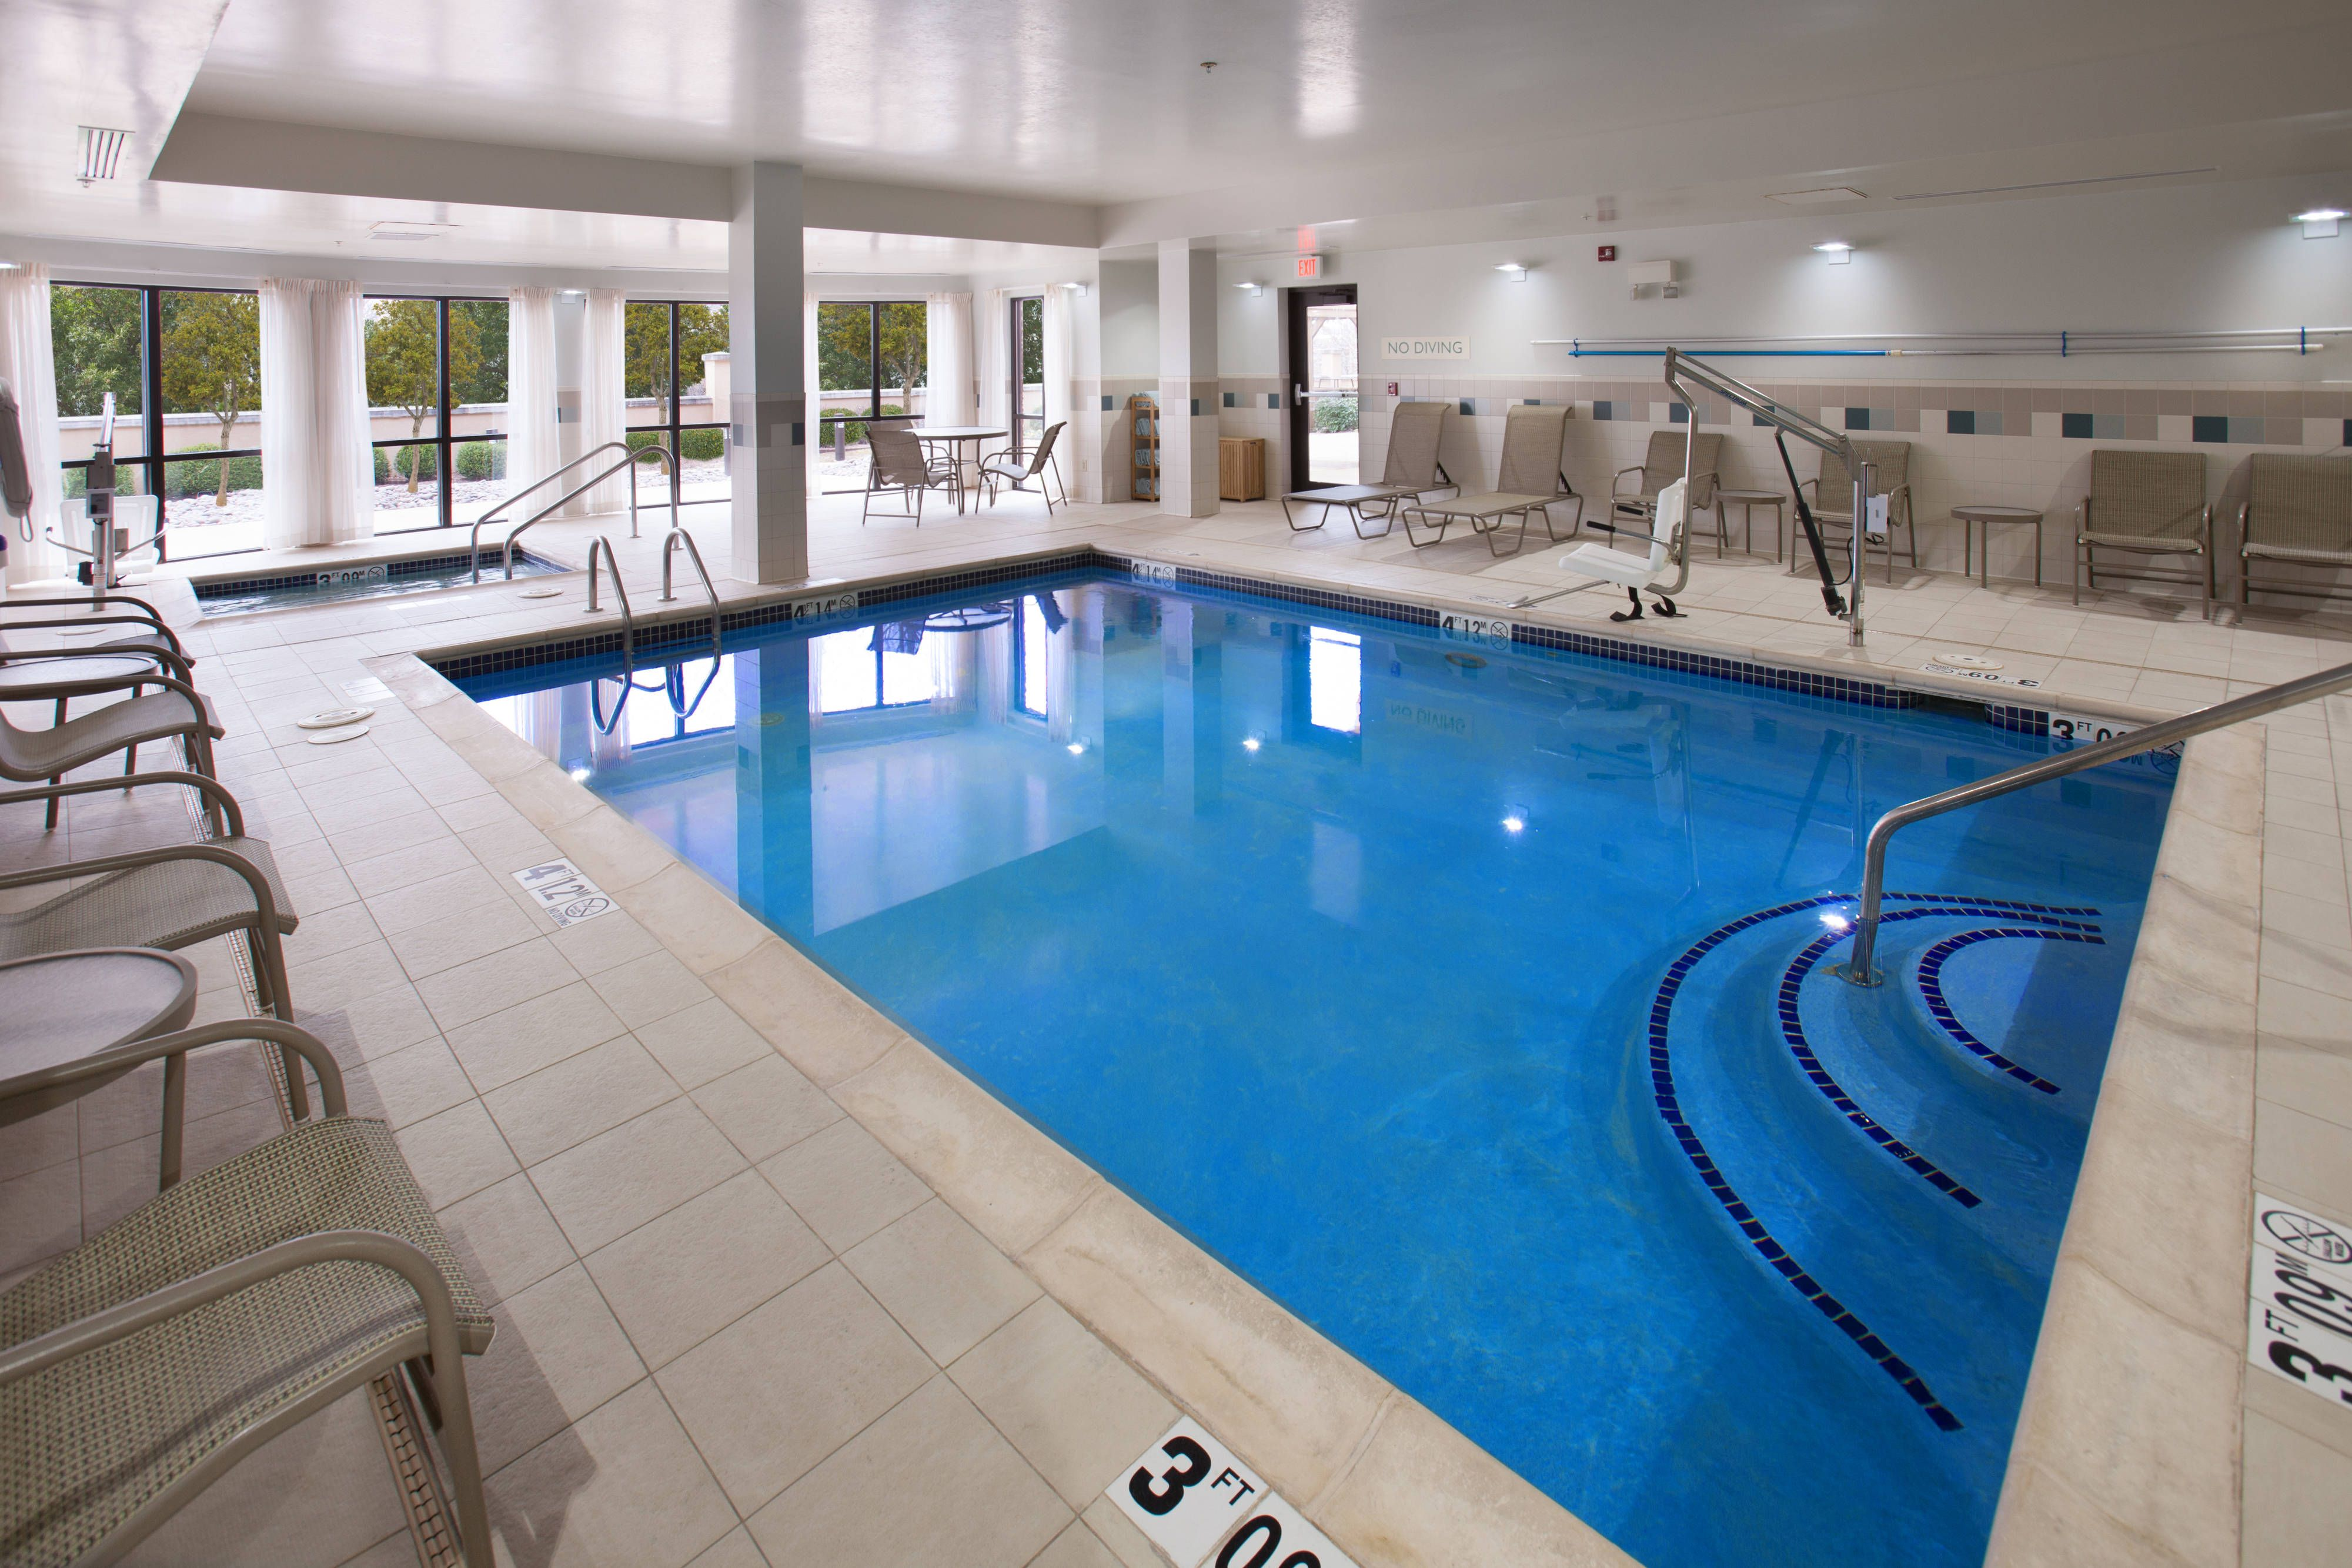 Courtyard Fayetteville Indoor Pool Courtyard Indoor Pool Courtyard Hotel